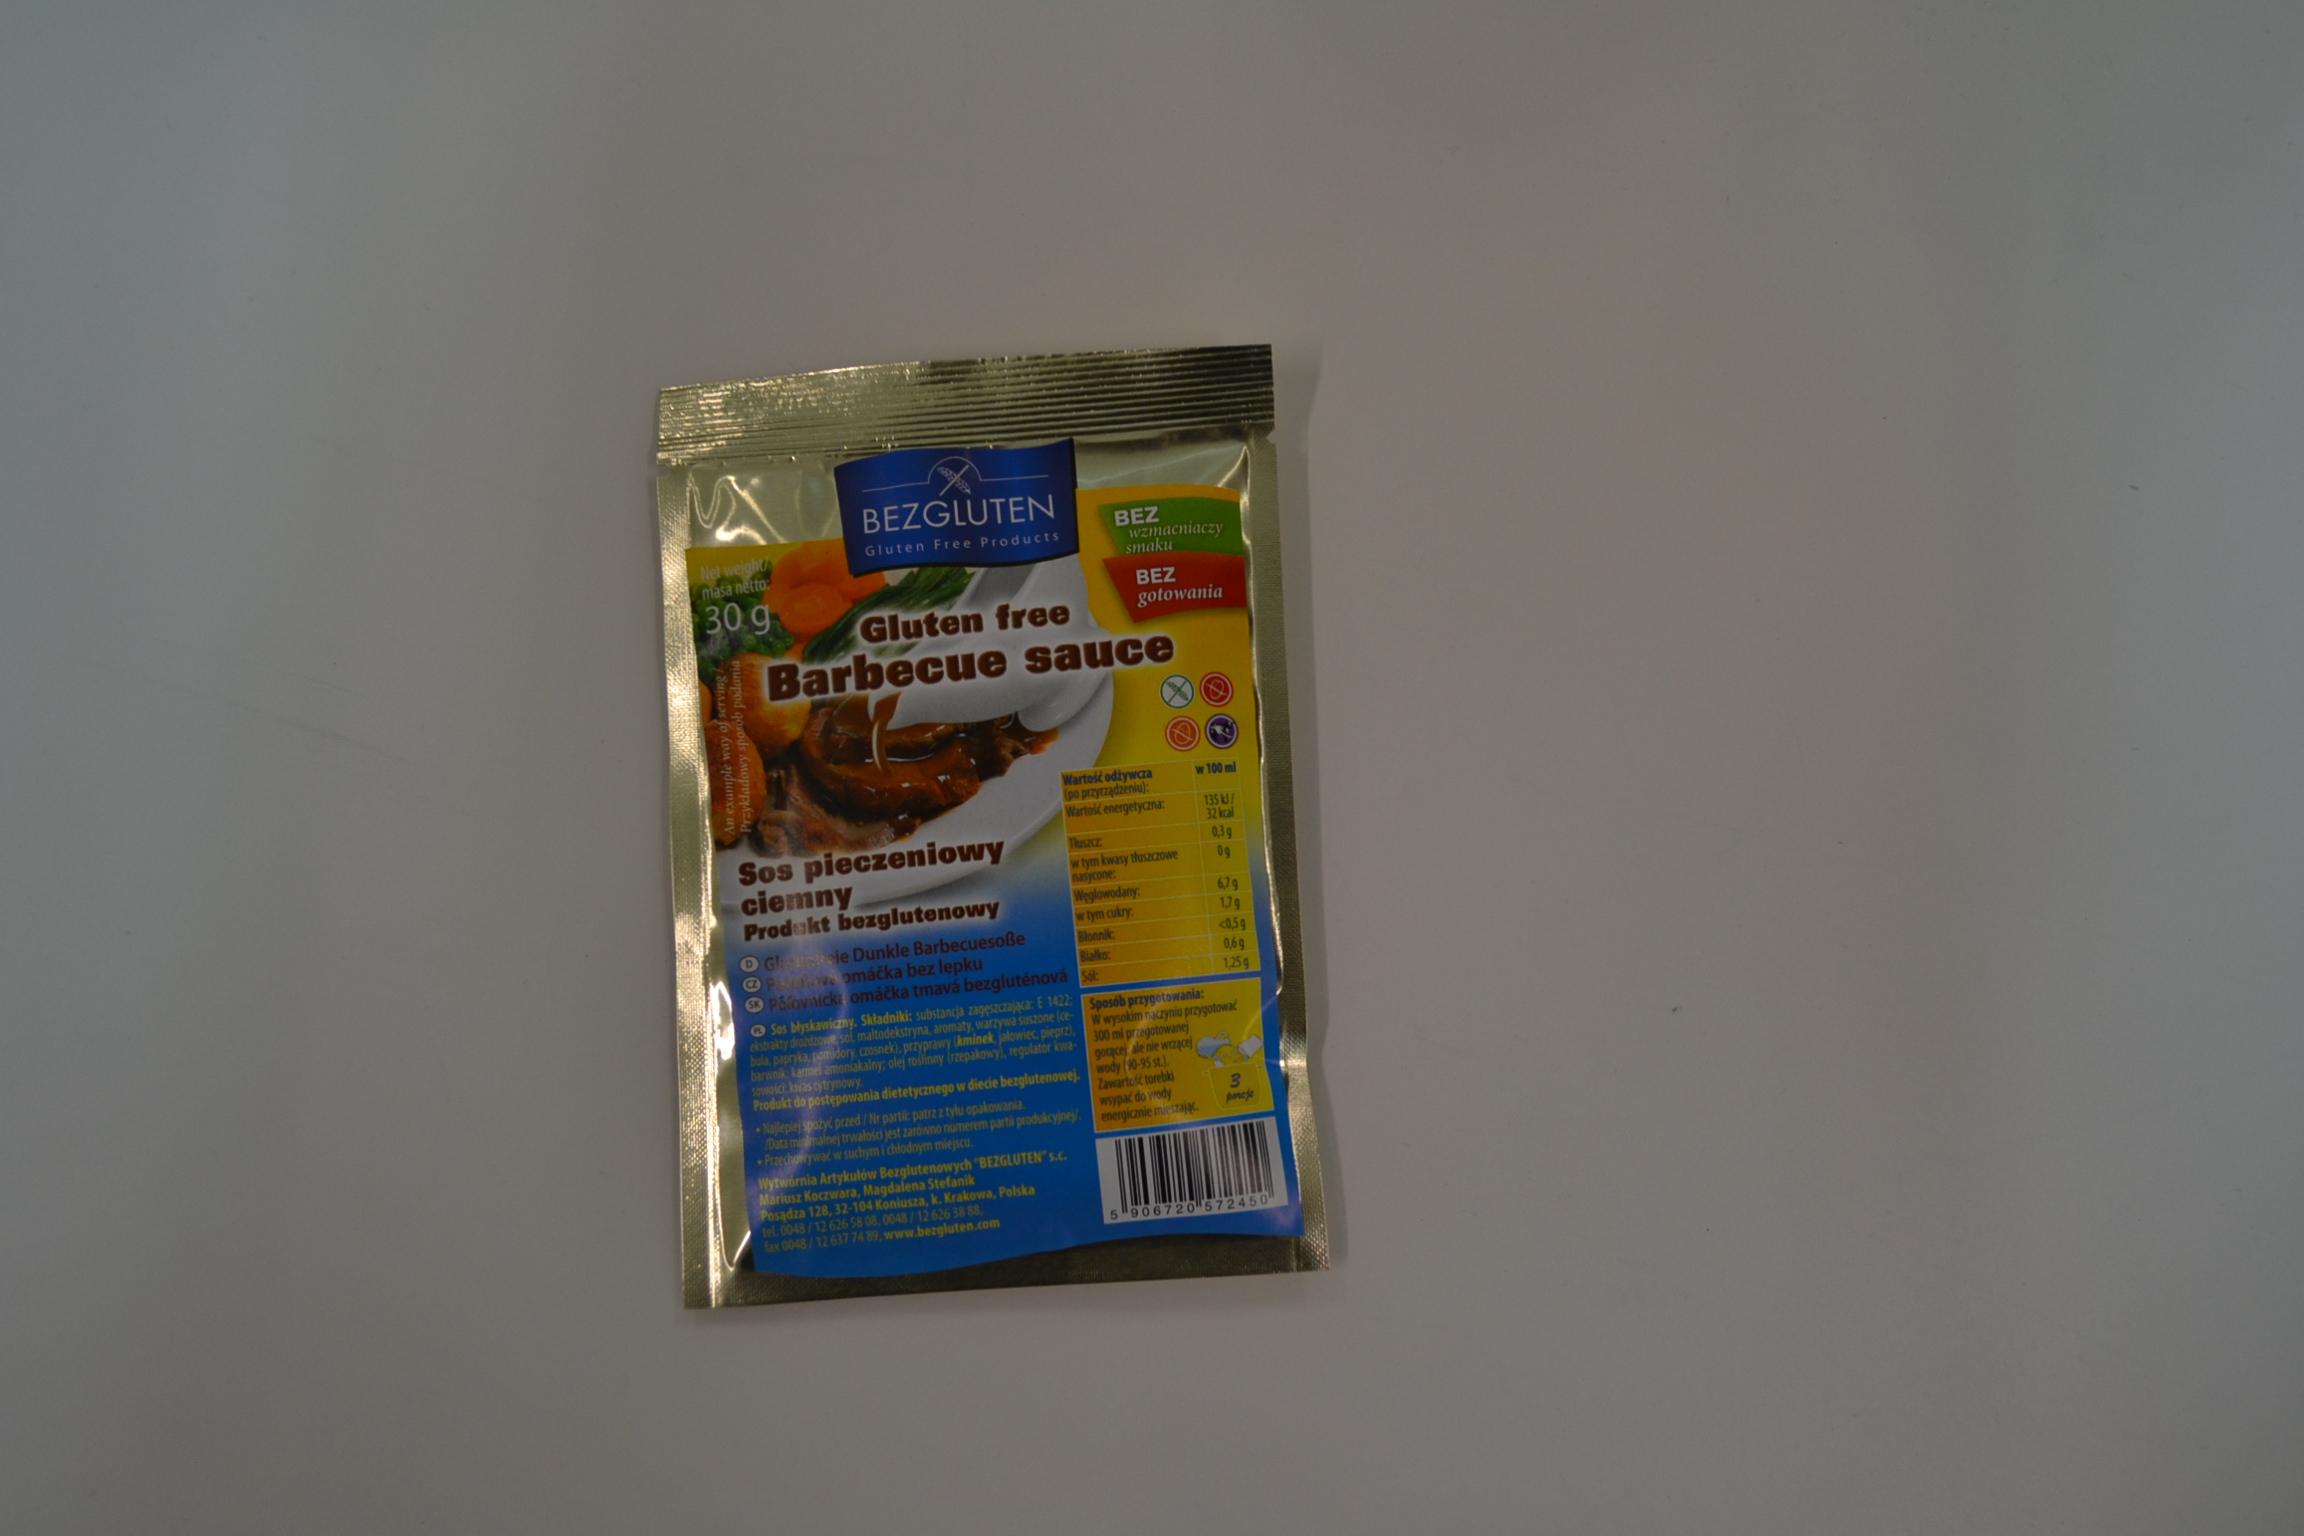 Barbecue sauce BEZGLUTEN € 1,80